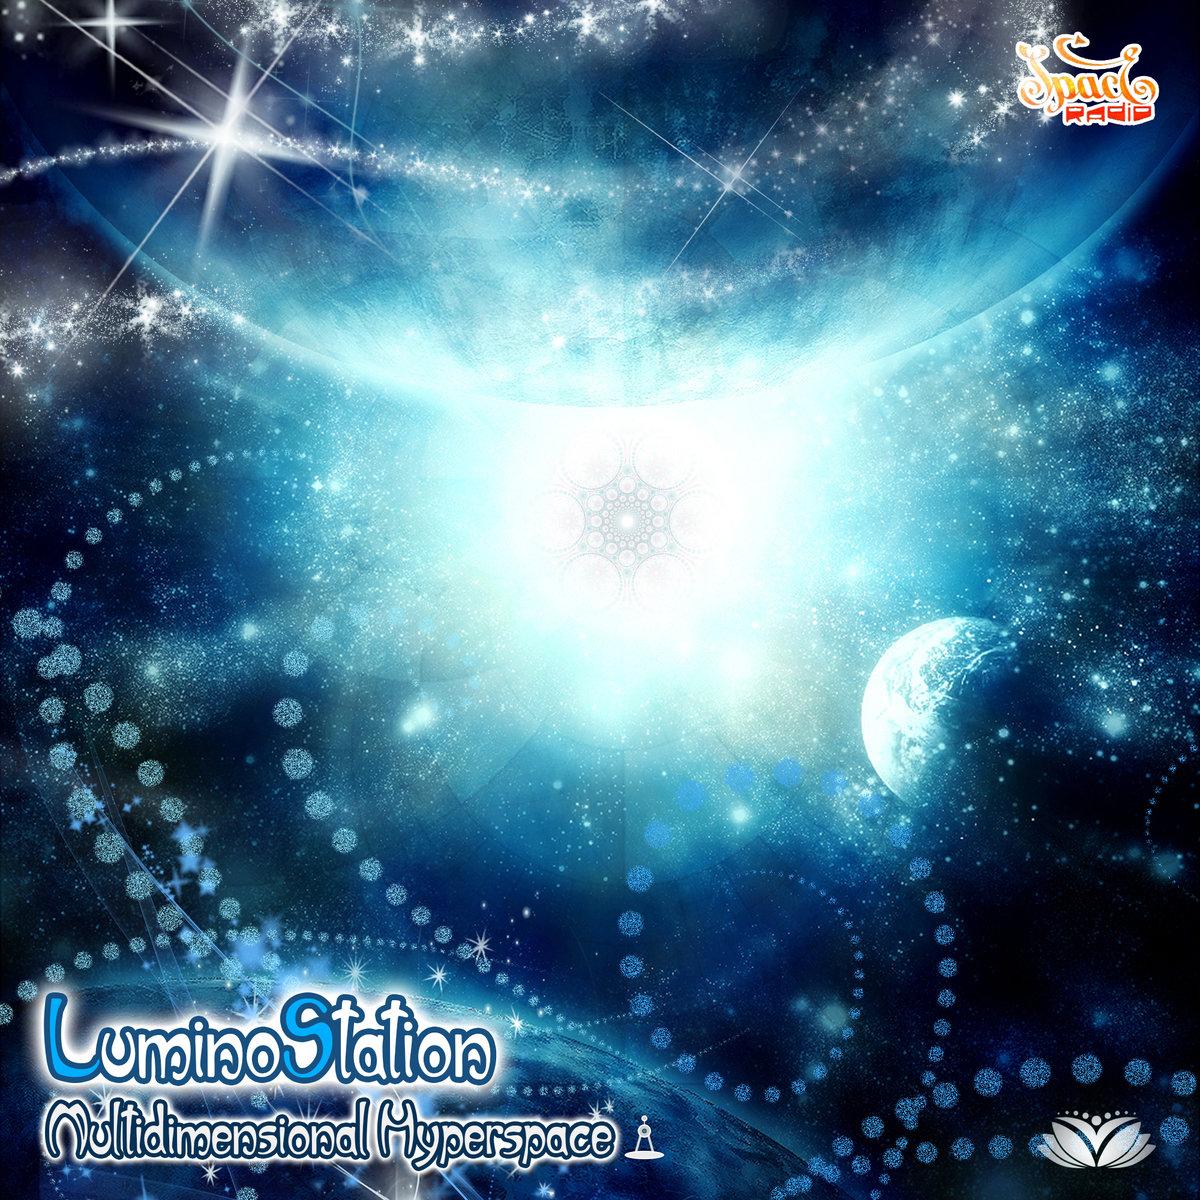 LuminoStation - Multidimensional Hyperspace